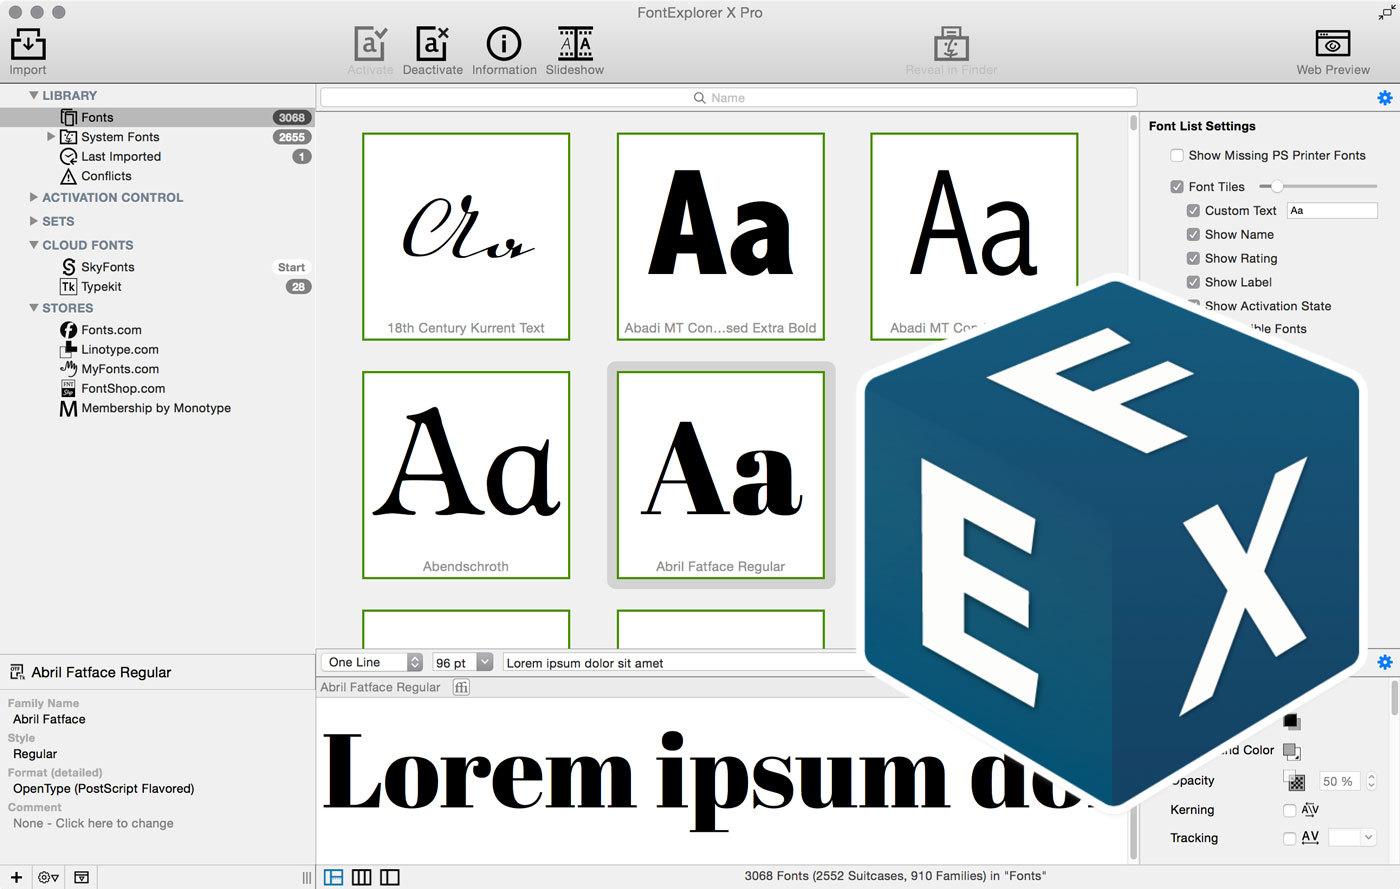 Fex Quotes What's New In Fontexplorer X Pro 5  Journal  Typography.guru